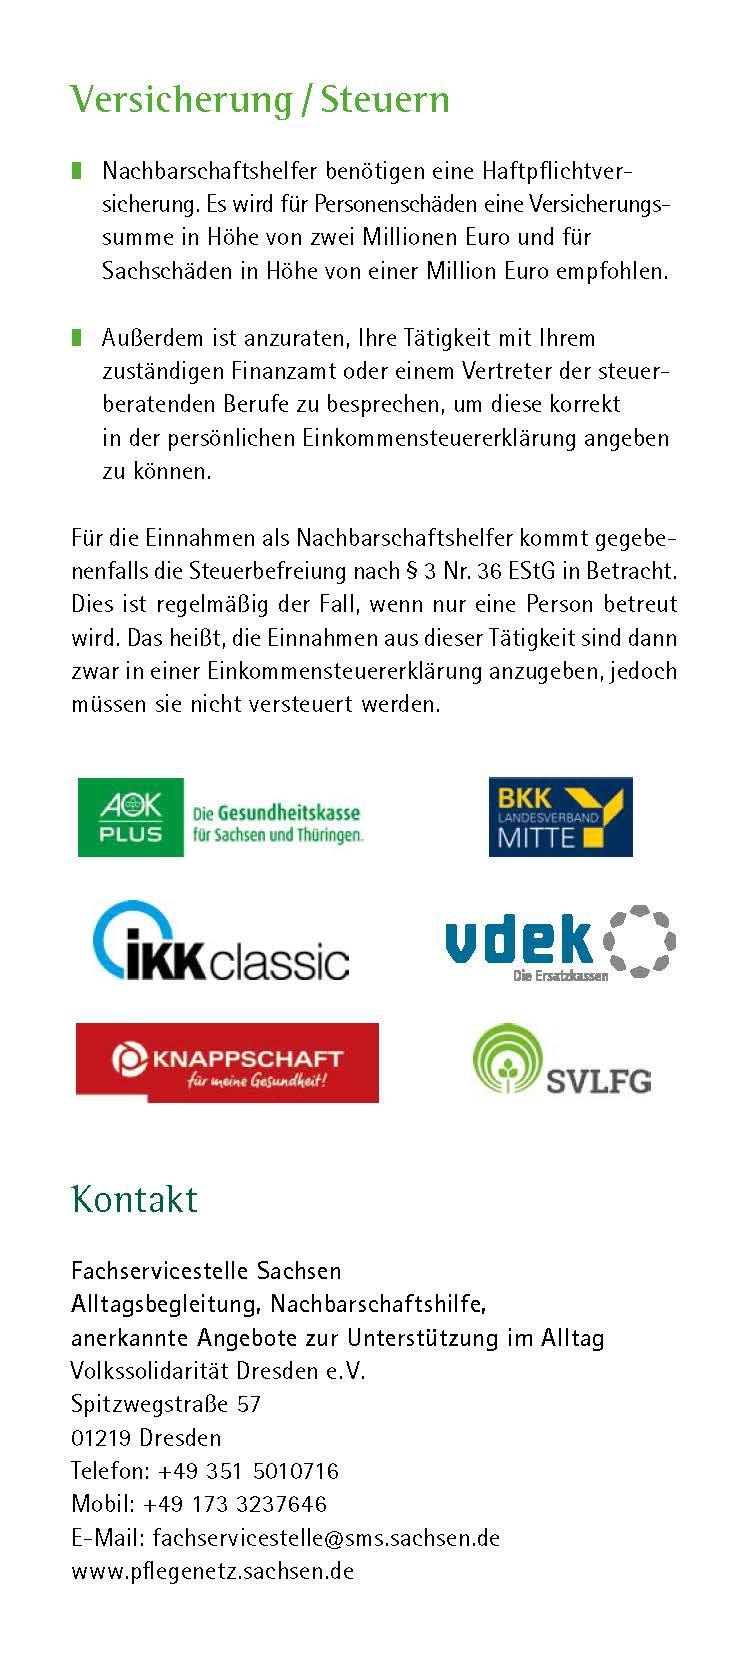 2019_FSS_FB_Nachbarschaftshilfe-Alltagsbegleitung_PDF-UA_Seite_5.jpg